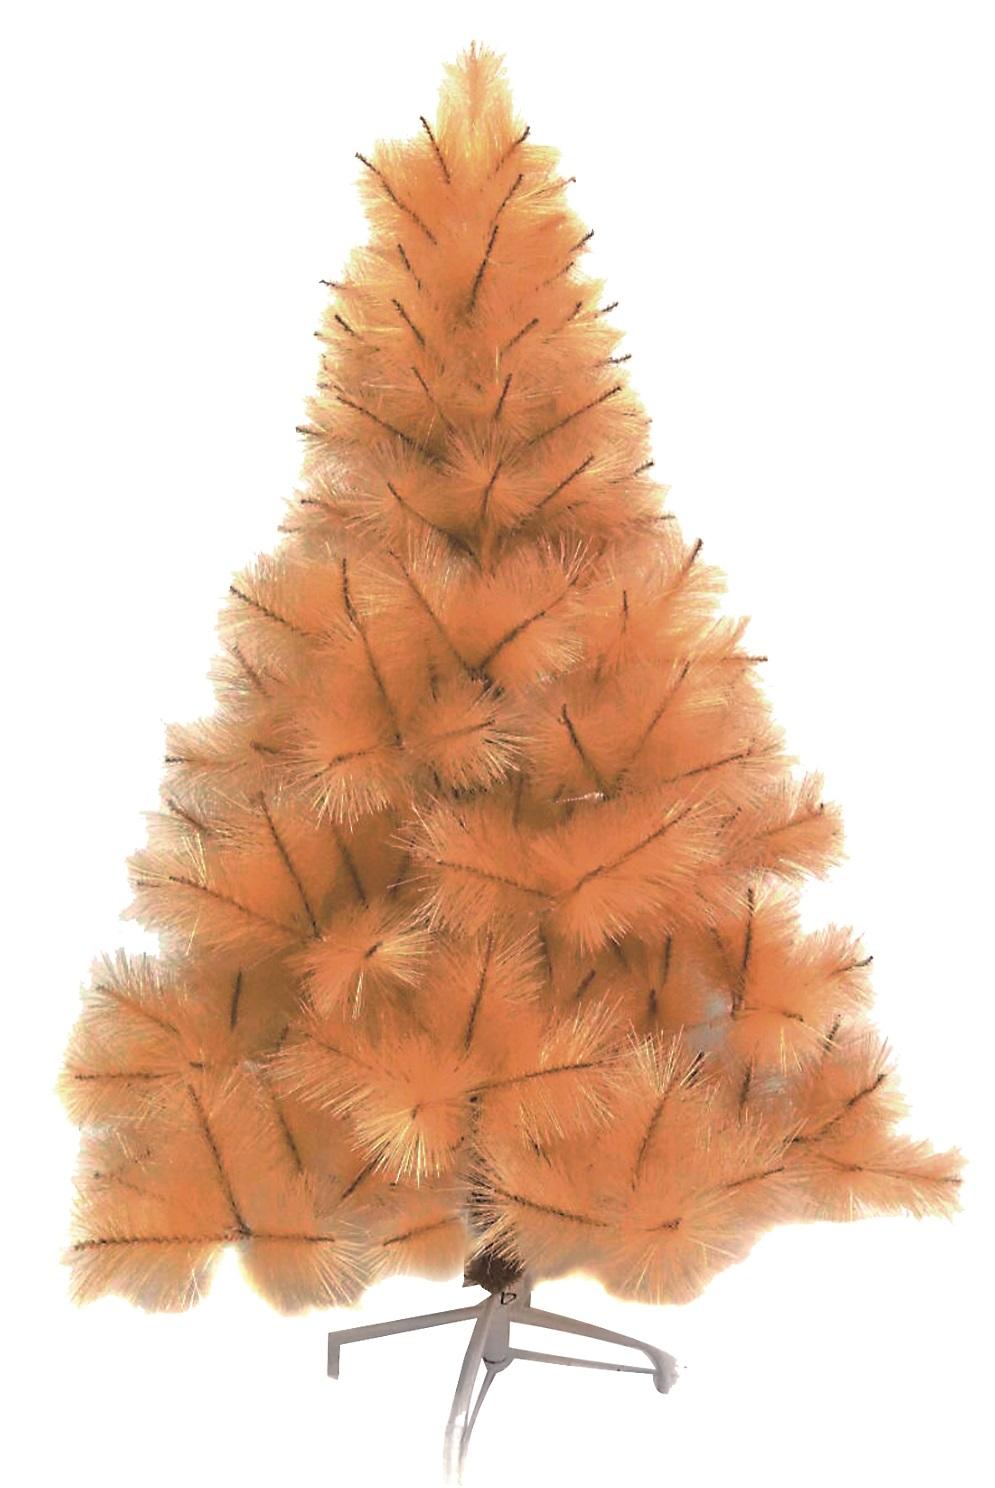 X射線【X020480】2尺聖誕松針樹(金)(不含飾品、燈飾),聖誕樹/聖誕佈置/聖誕空樹/聖誕造景